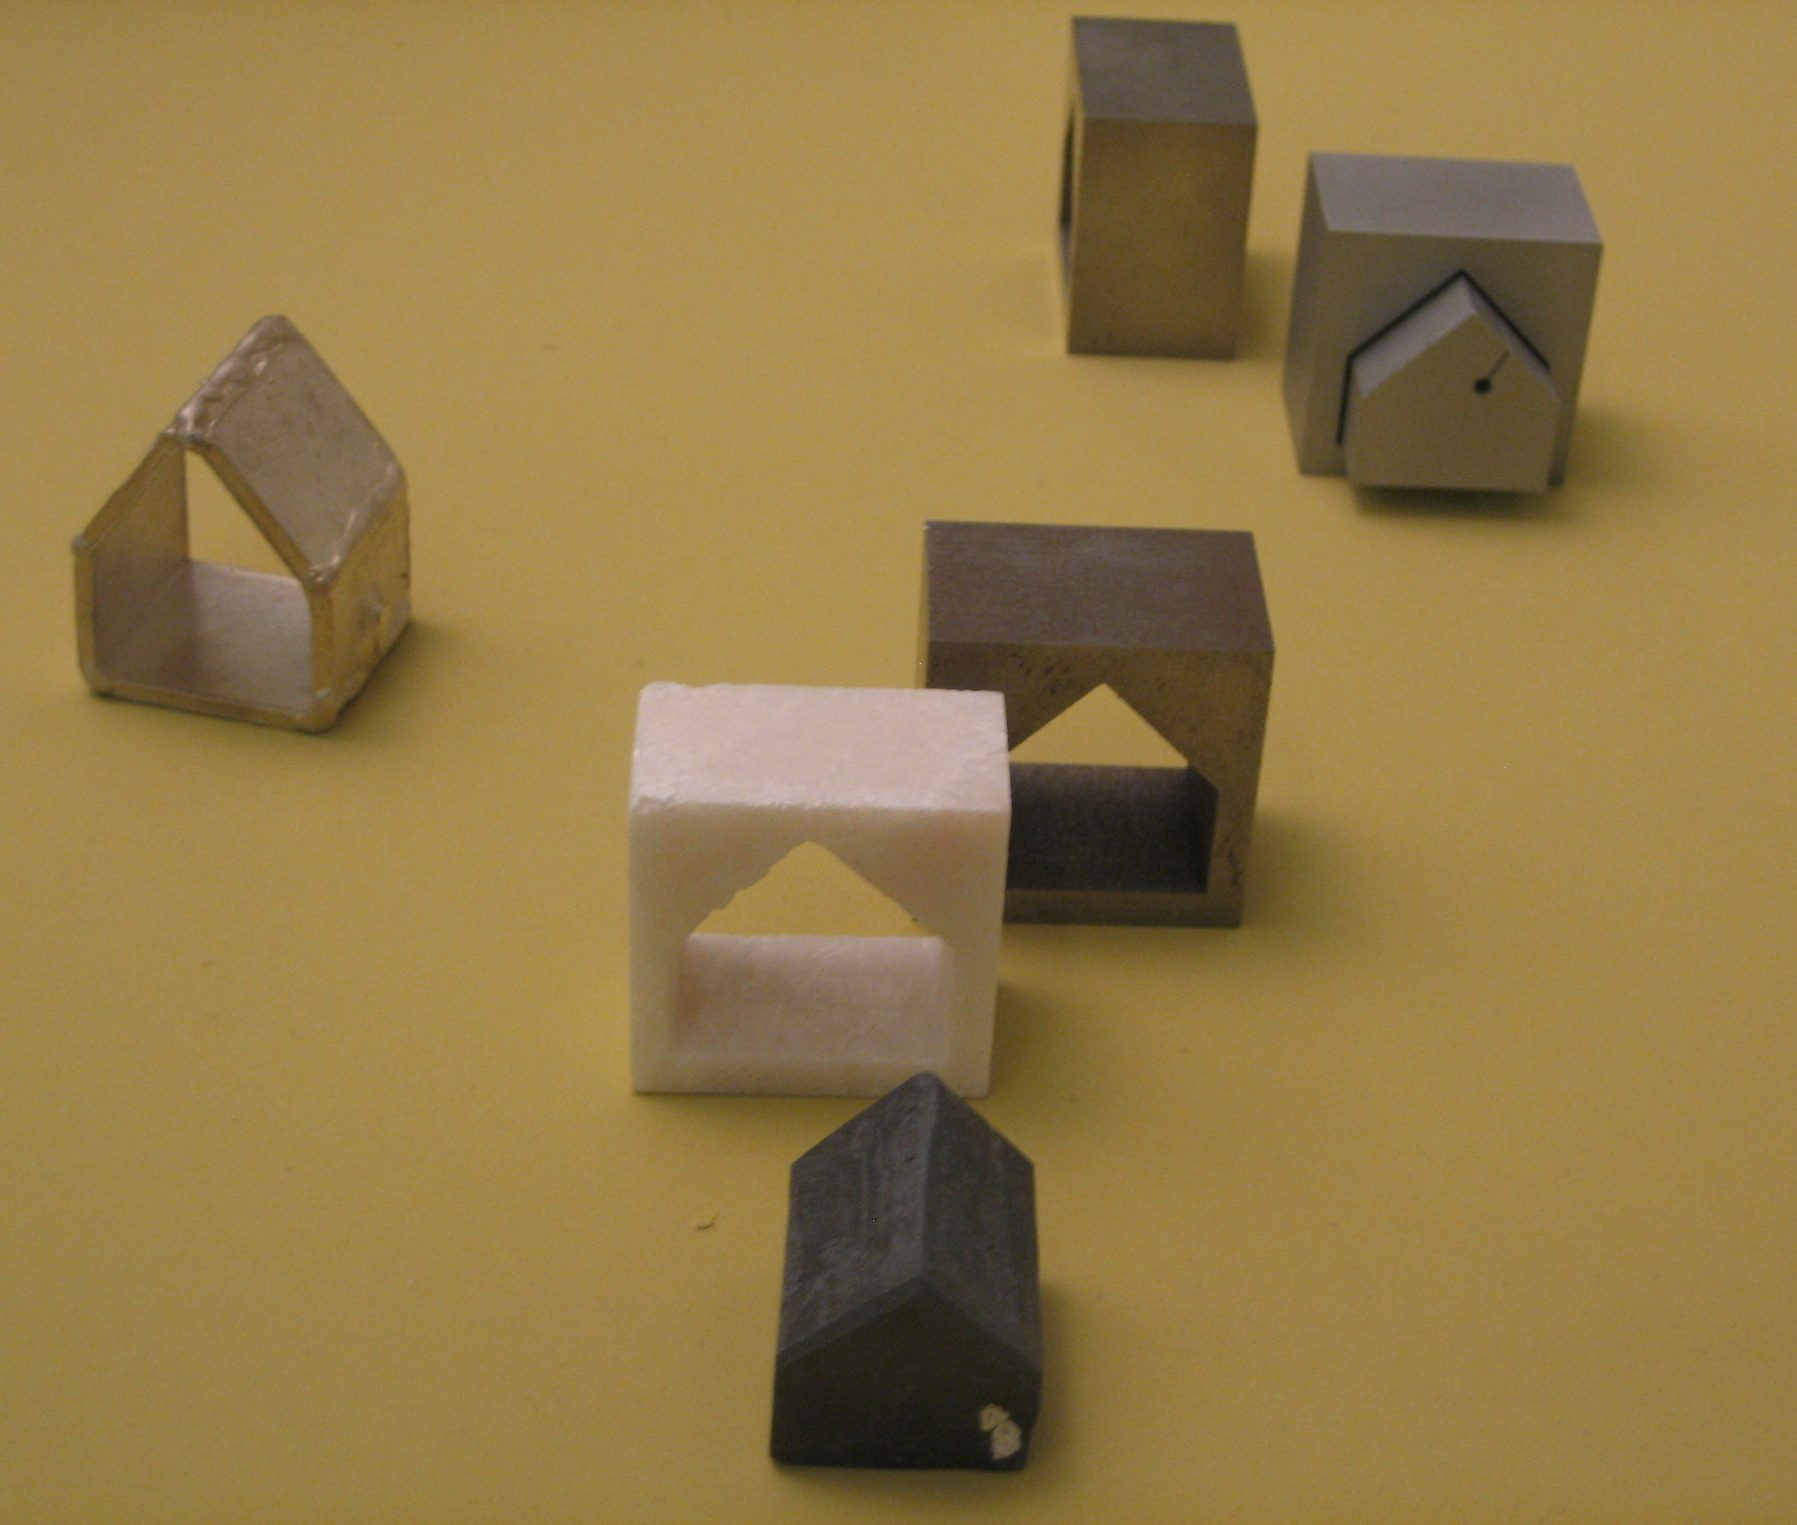 Werk in uitvoering, CODA, 2010, tentoonstelling